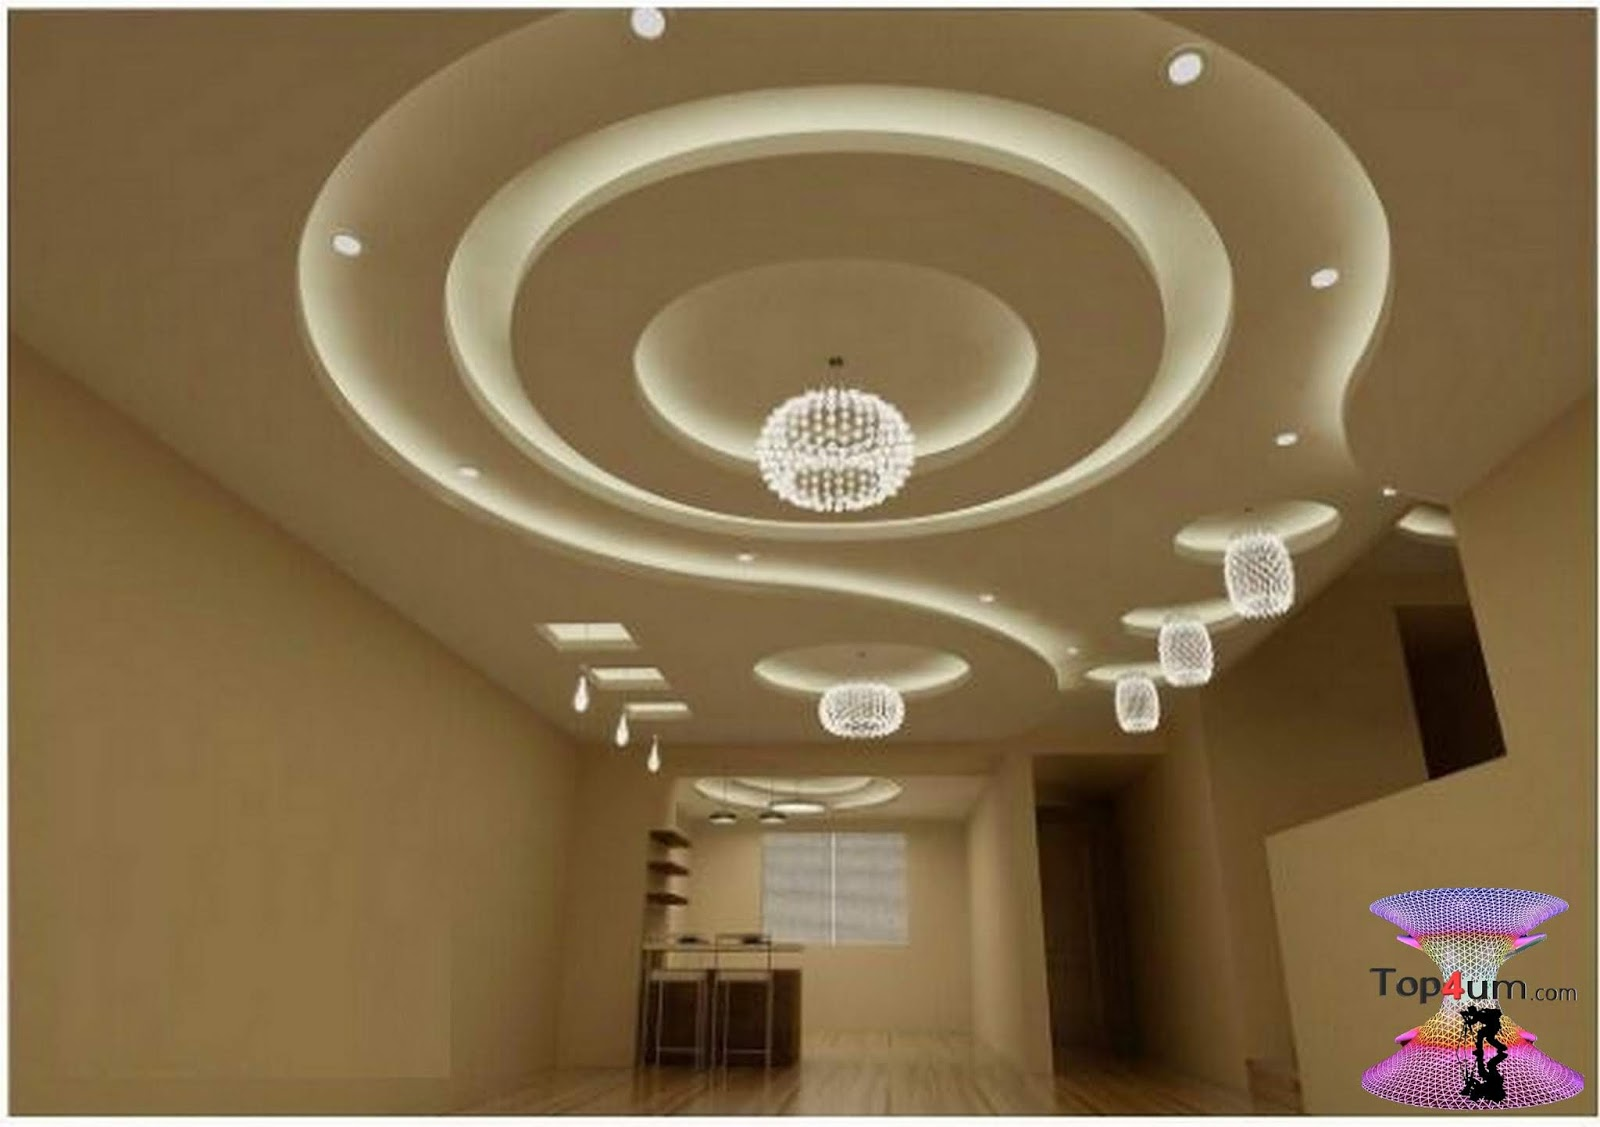 افضل ديكورات جبس اسقف راقيه 2019 Modern Gypsum Board For Walls And Ceilings Pop False Ceiling Design Bedroom False Ceiling Design Ceiling Design Modern